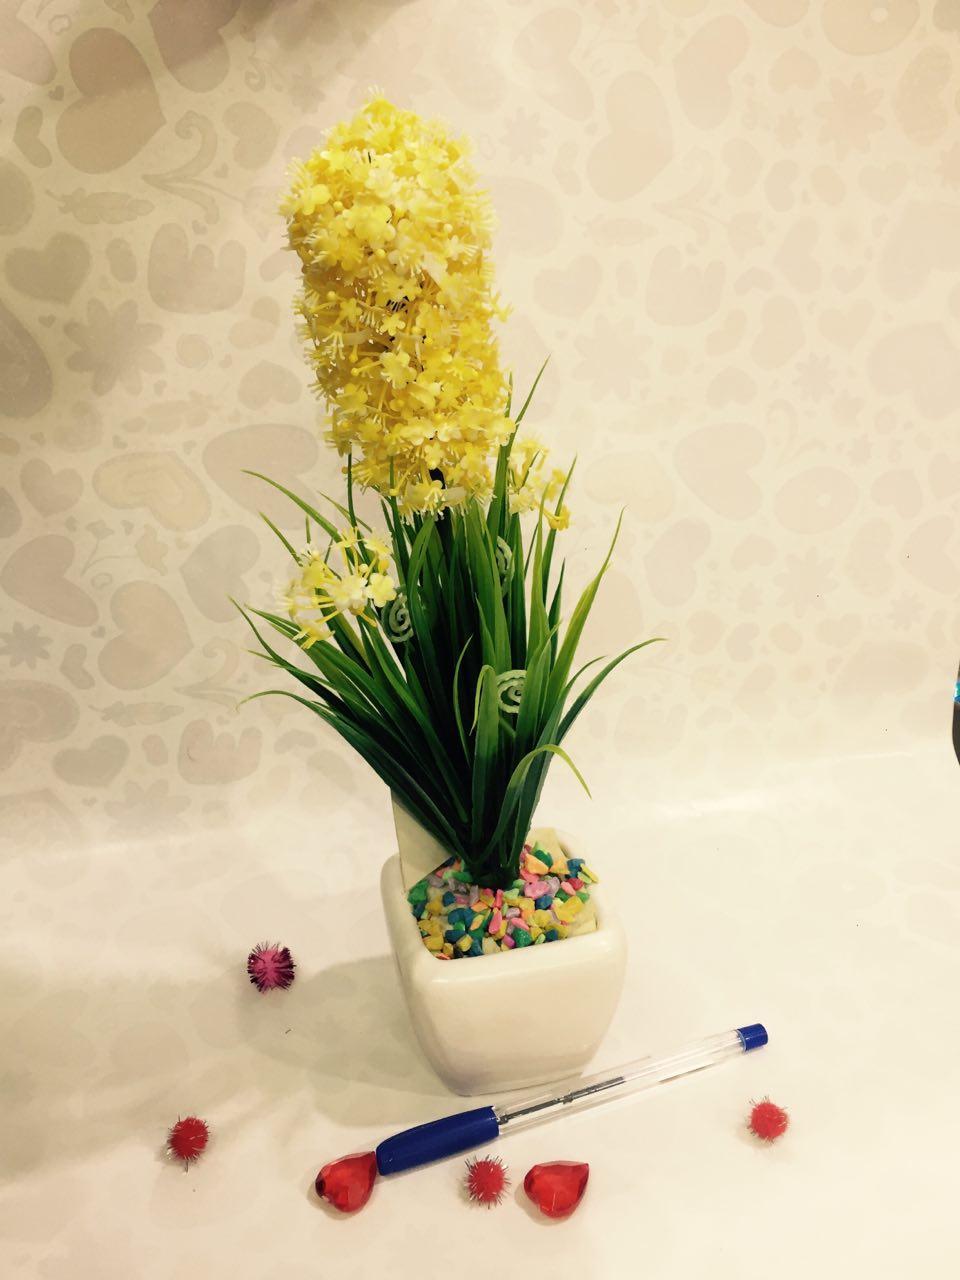 گل جزیره فانتزی دکوری Rk-n159